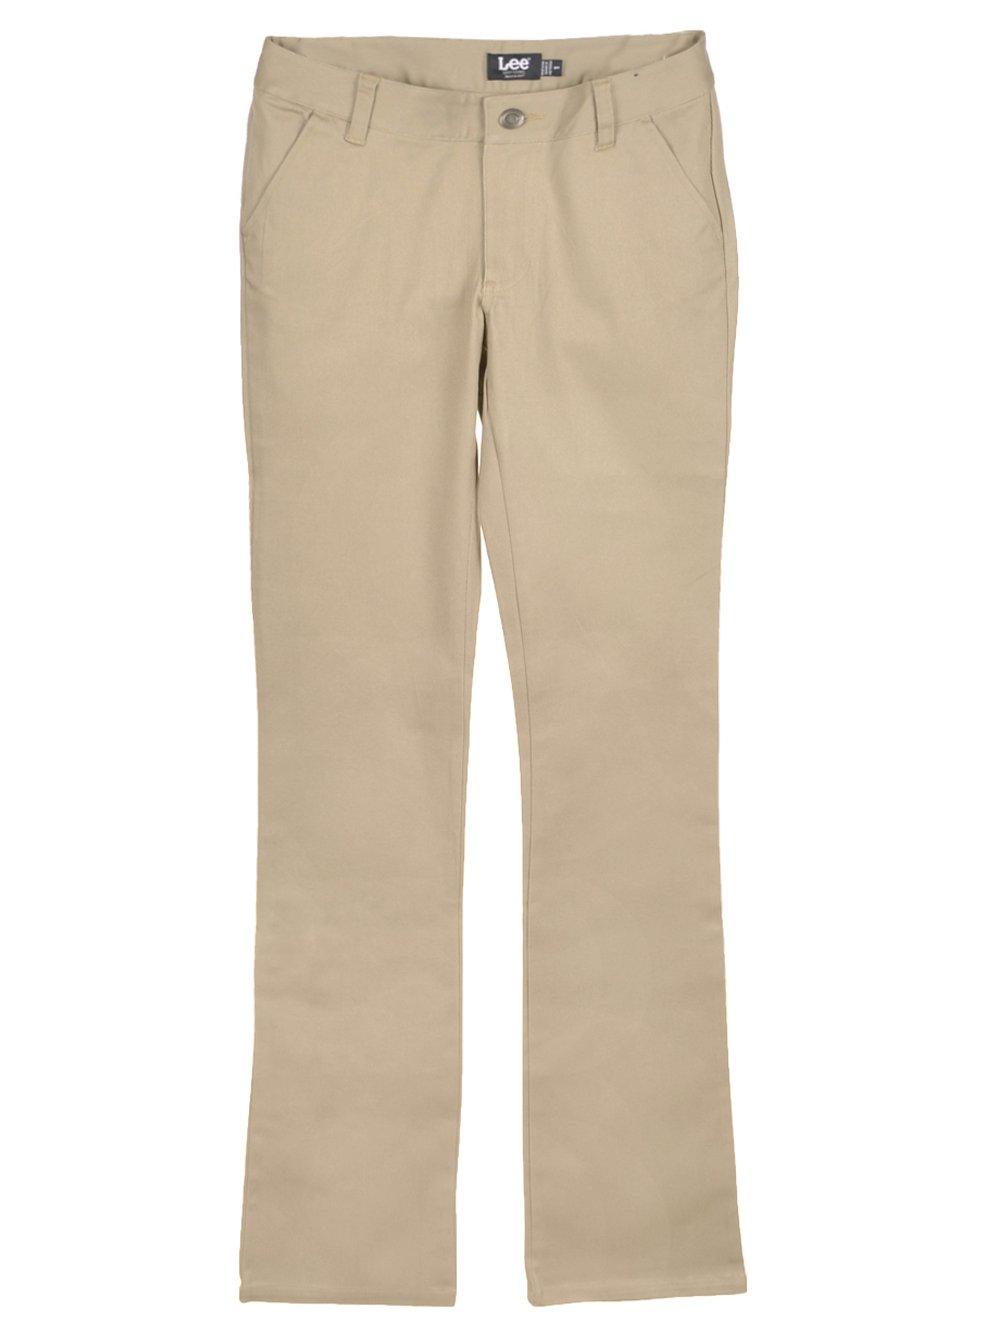 Lee Uniforms Juniors Curvey Straight Leg Pant, Khaki, 11